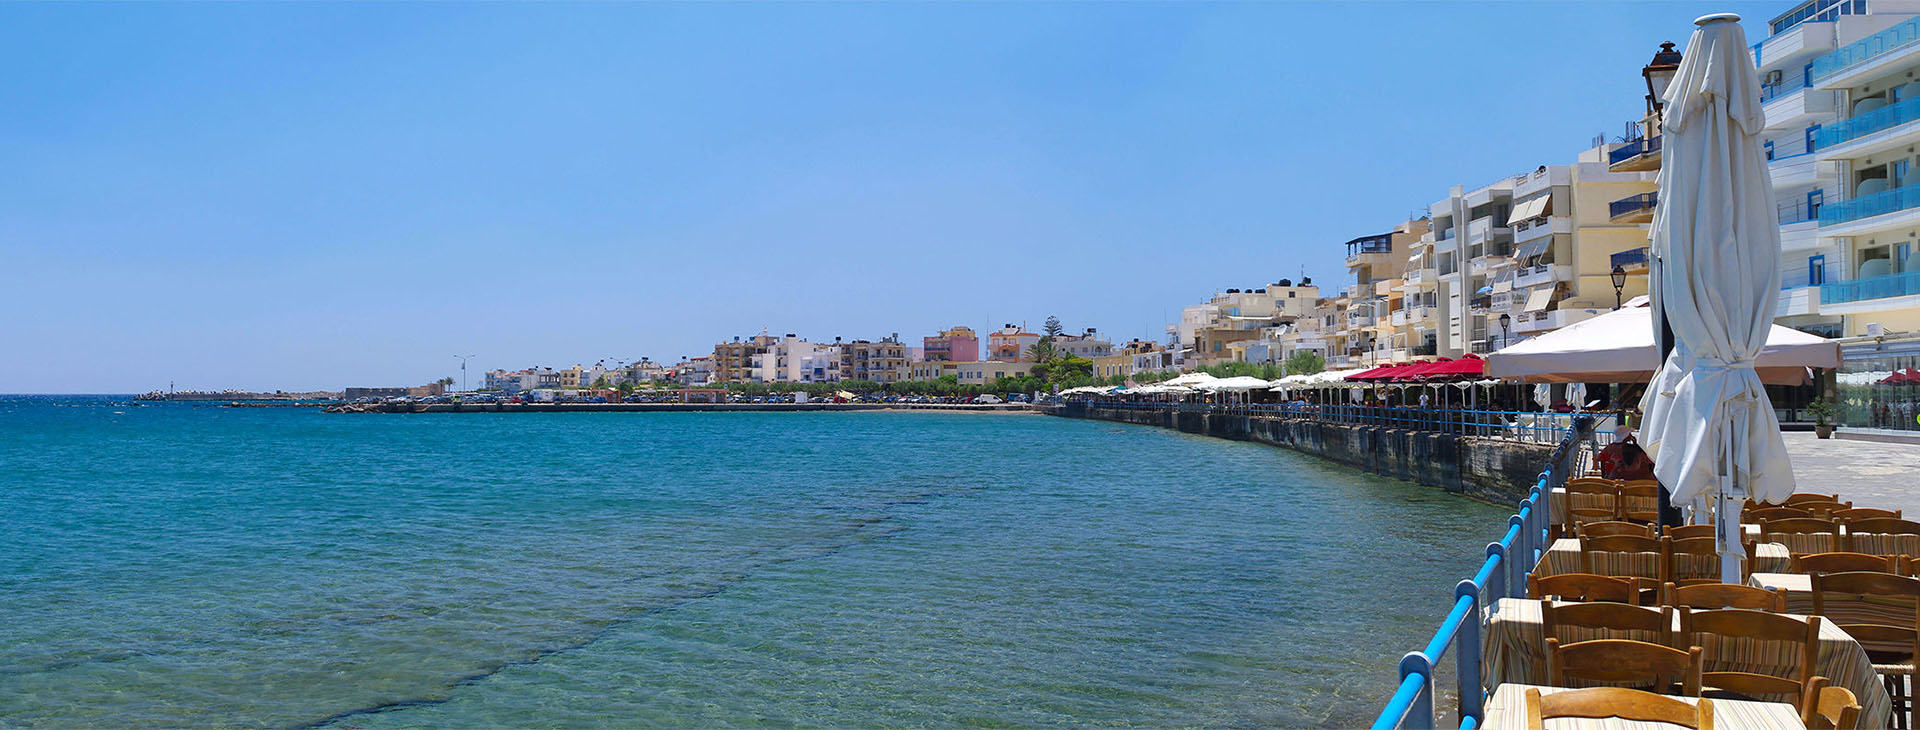 Ierapetra, Lassithi